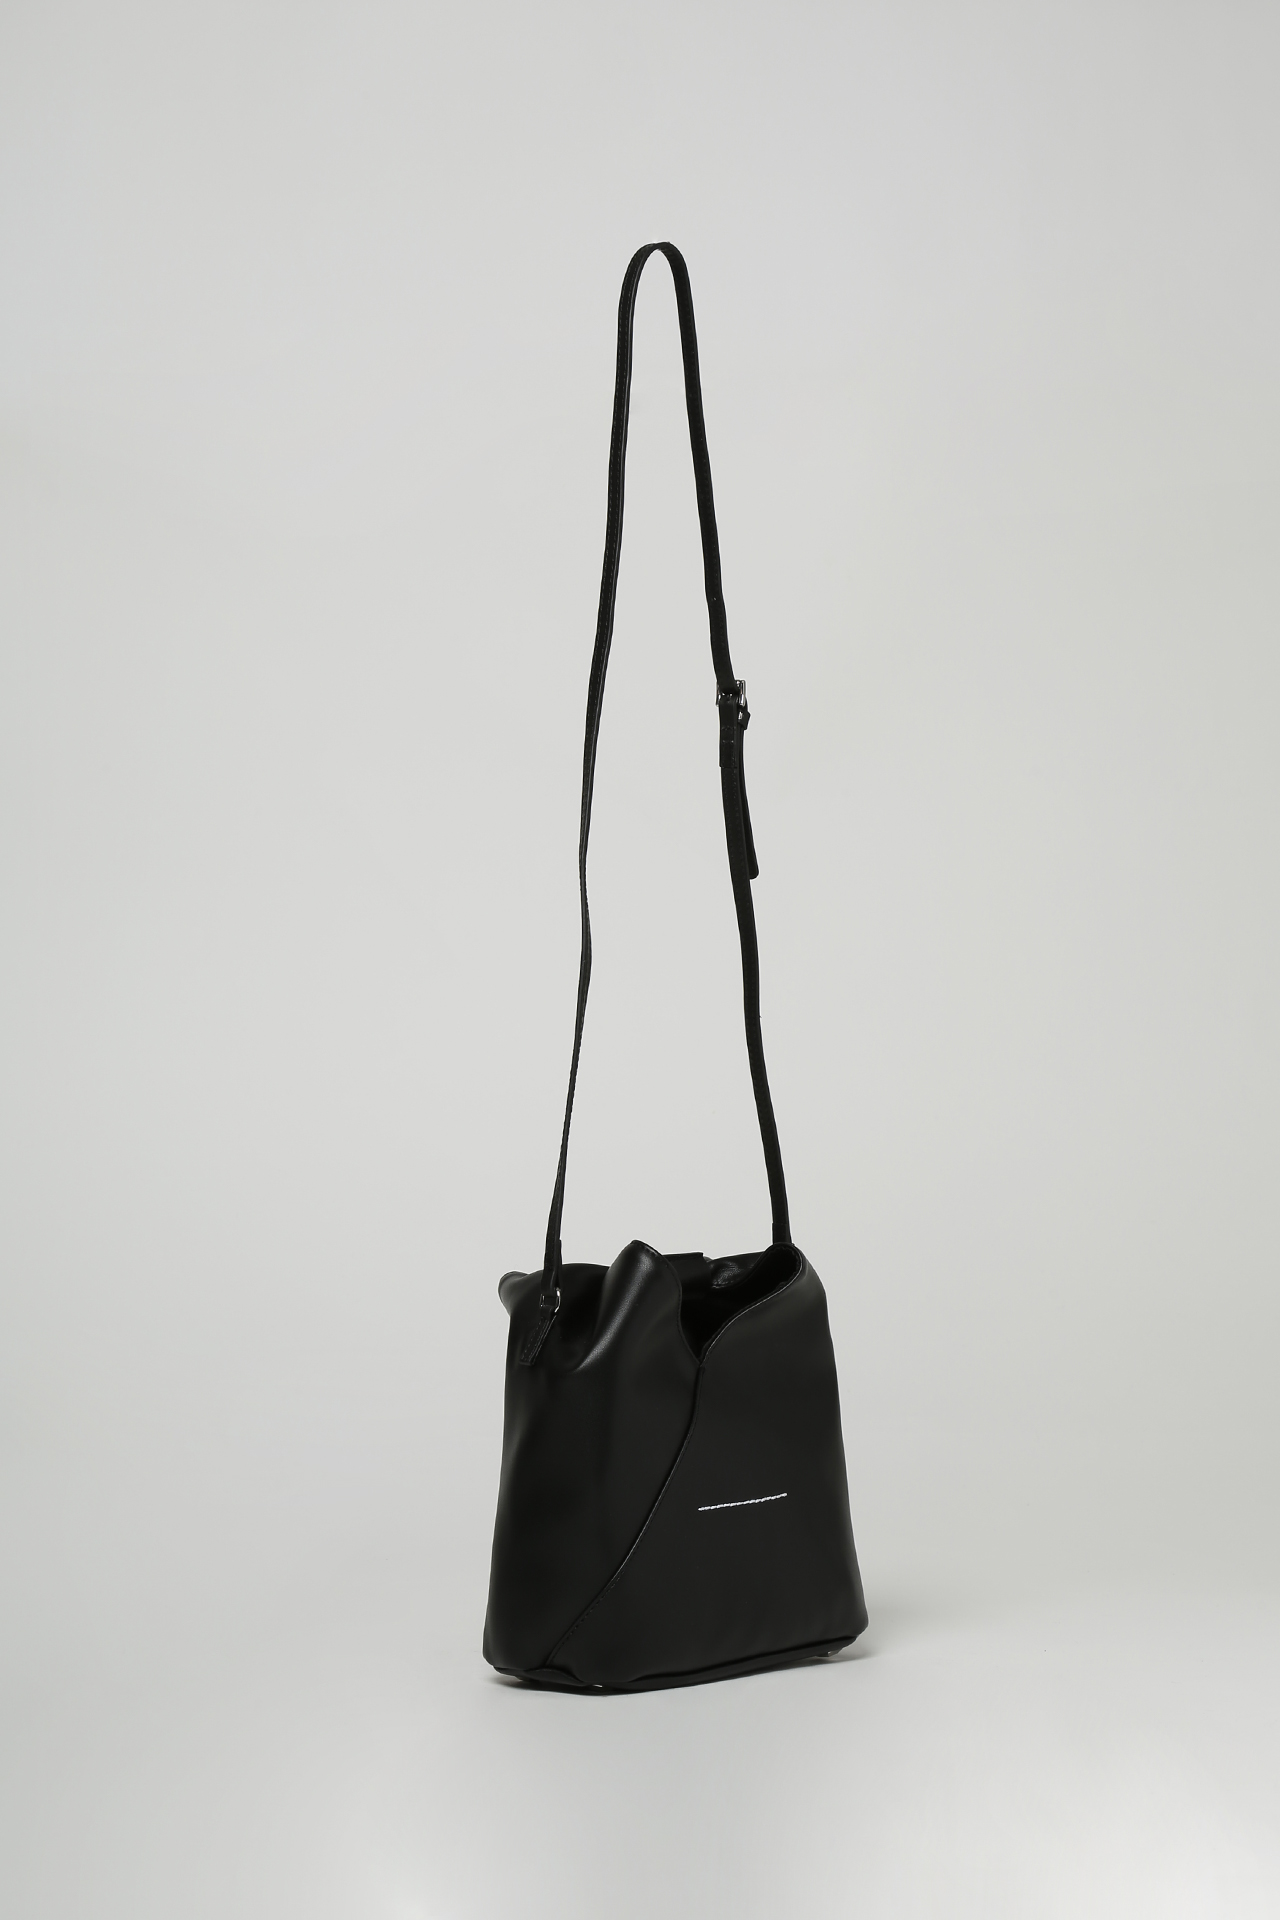 MM6 MAISON MARGIELA | Bag | S54WD0106-P4313NERO